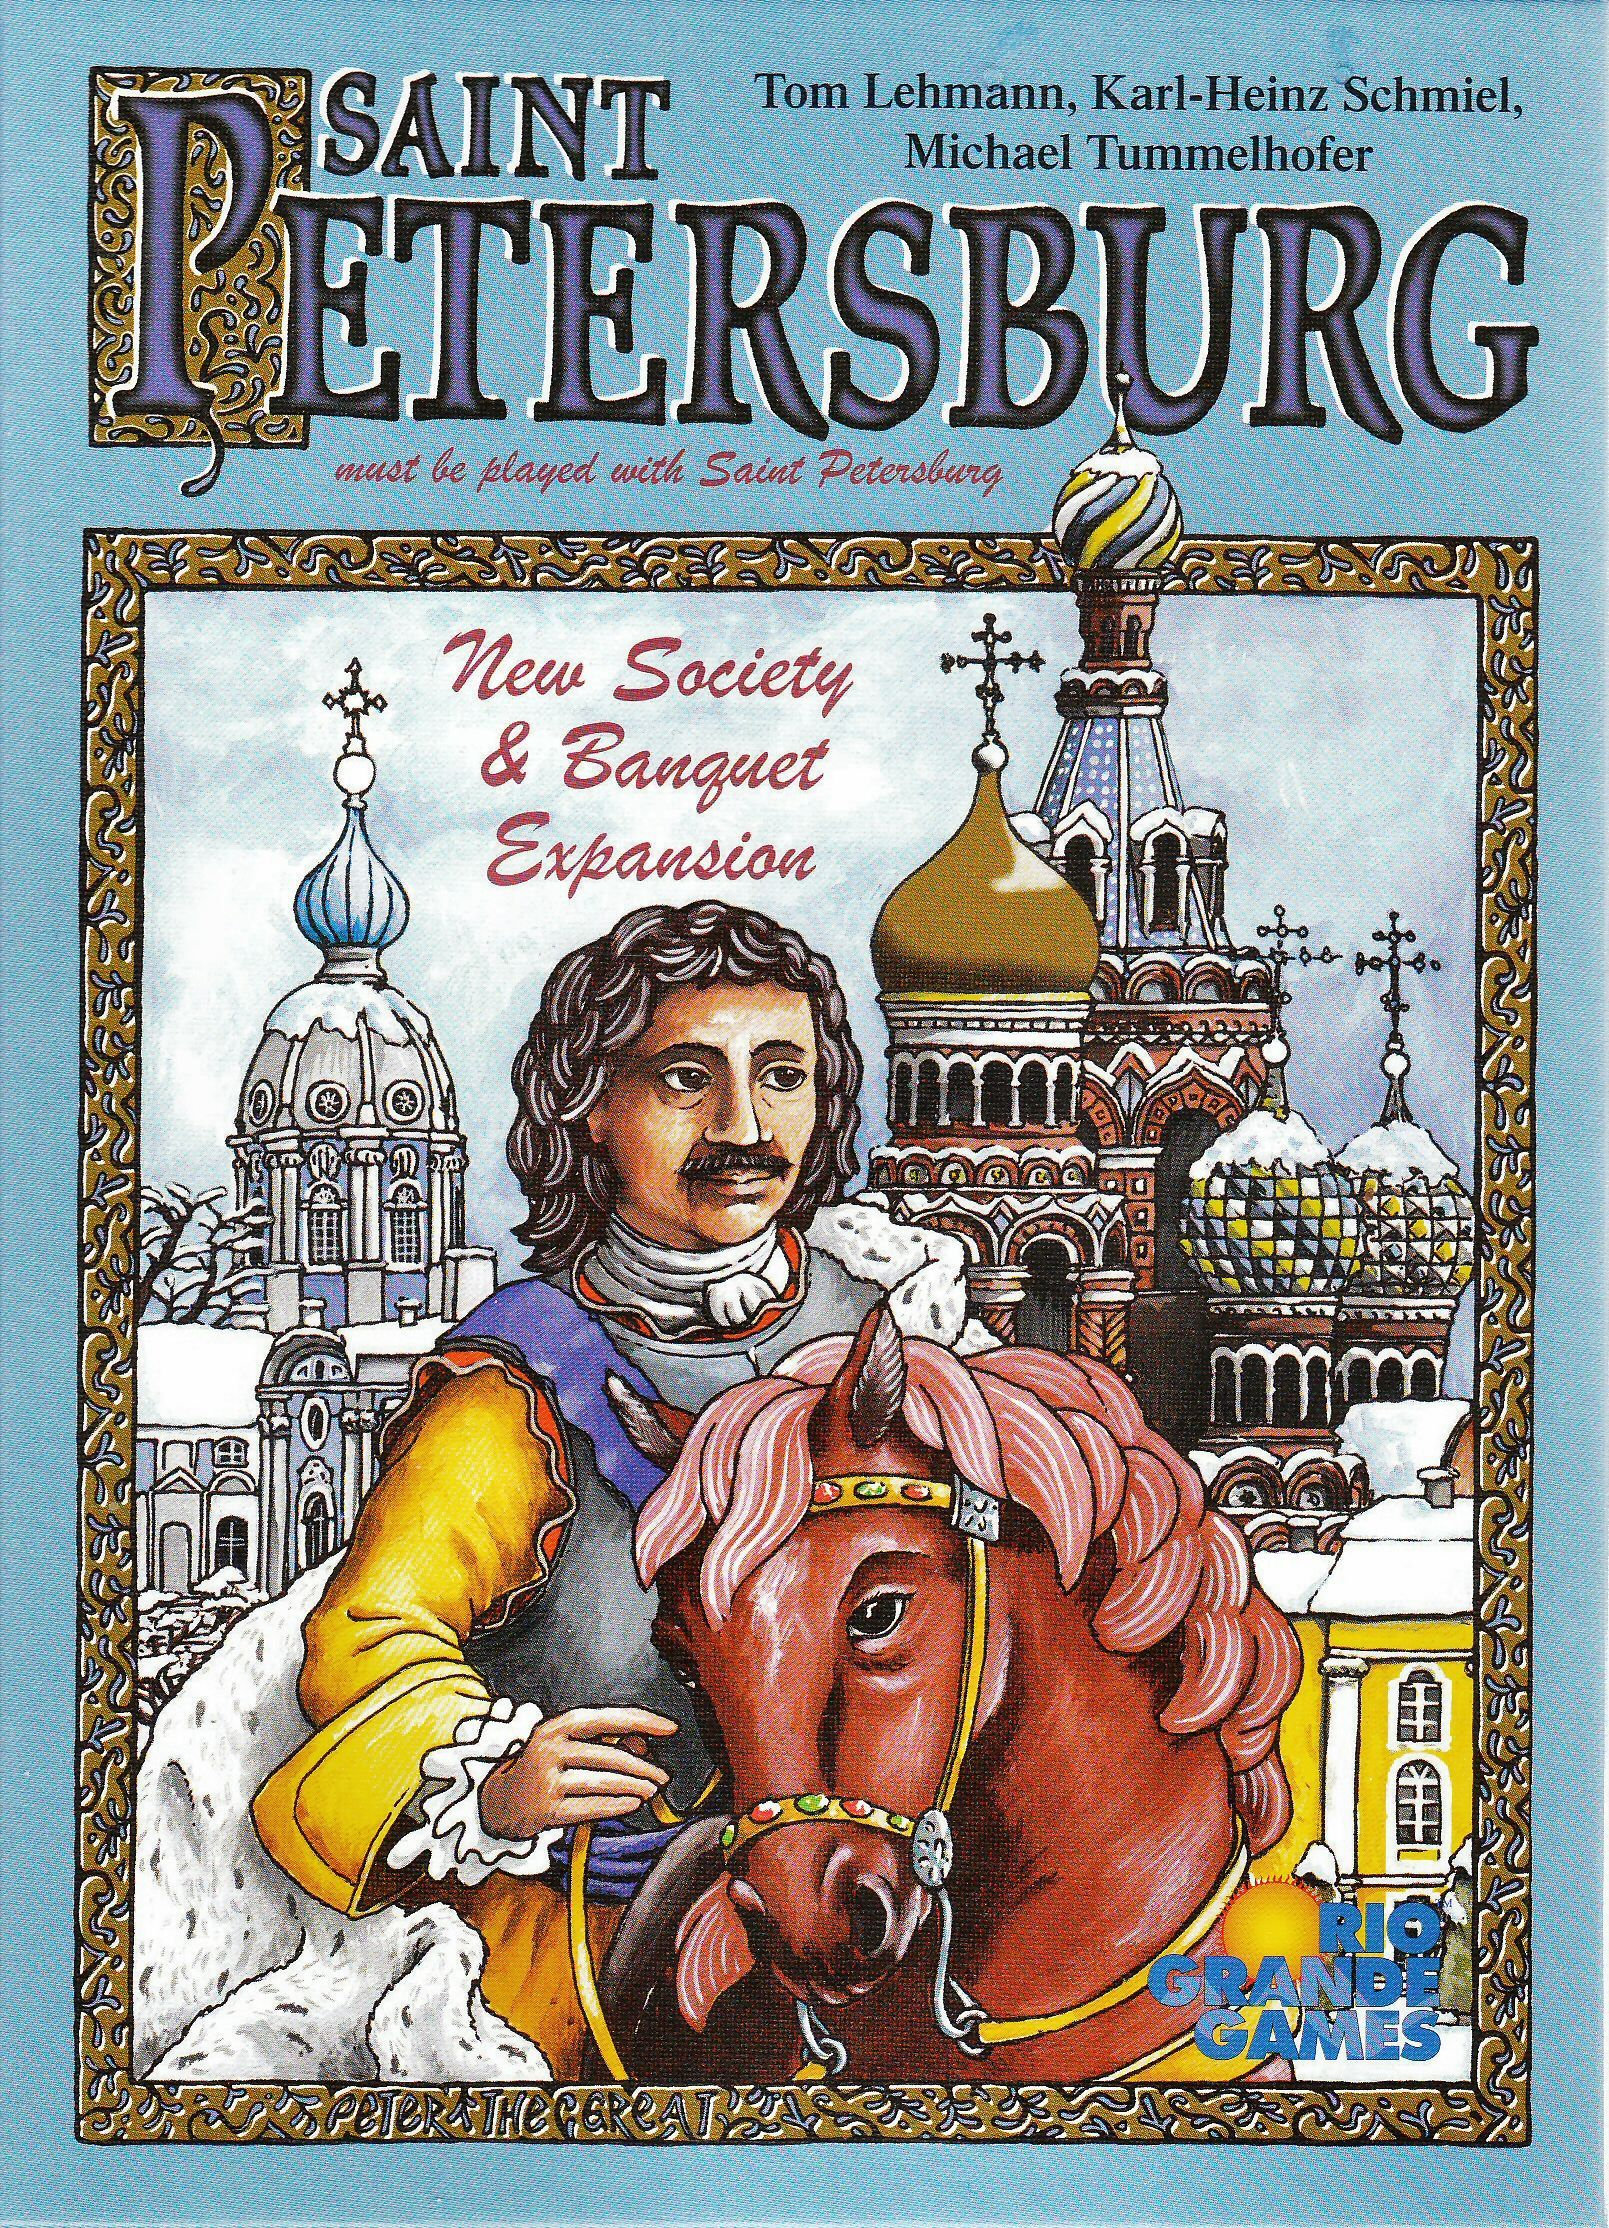 Saint Petersburg: New Society & Banquet Expansion